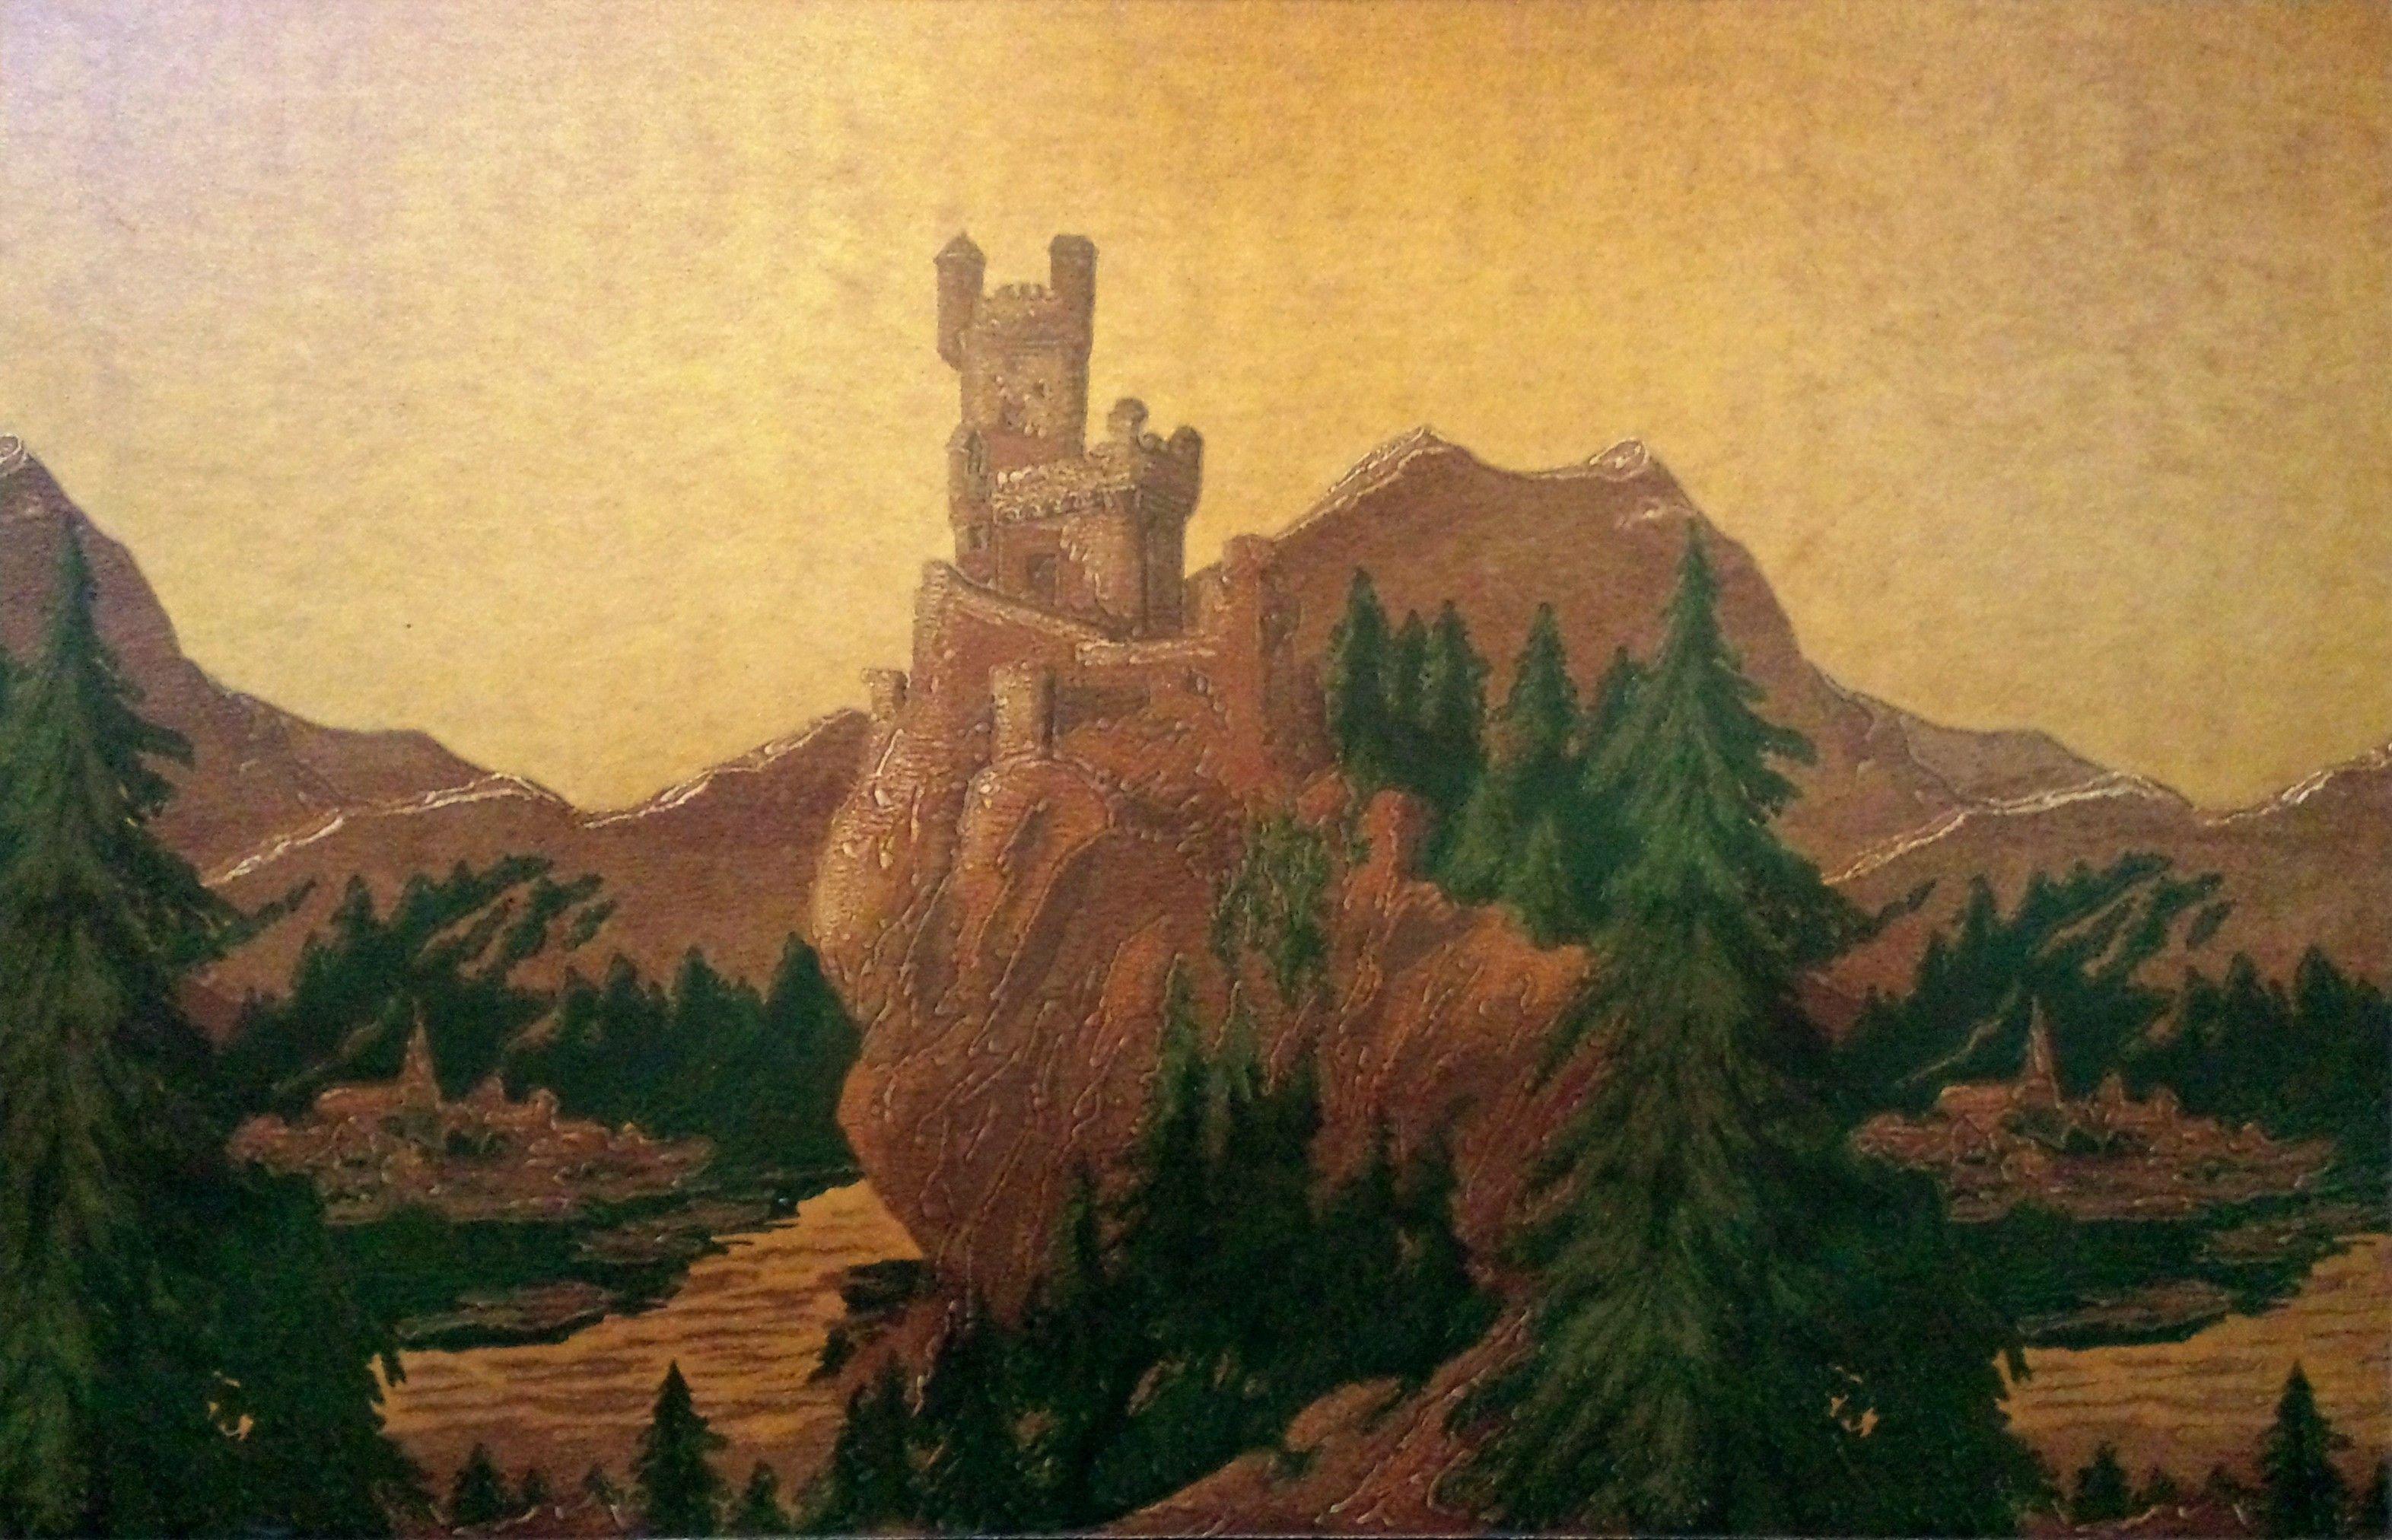 The Rhine Castles Frieze on GoldAntique WallpaperWall Art 3144x2024